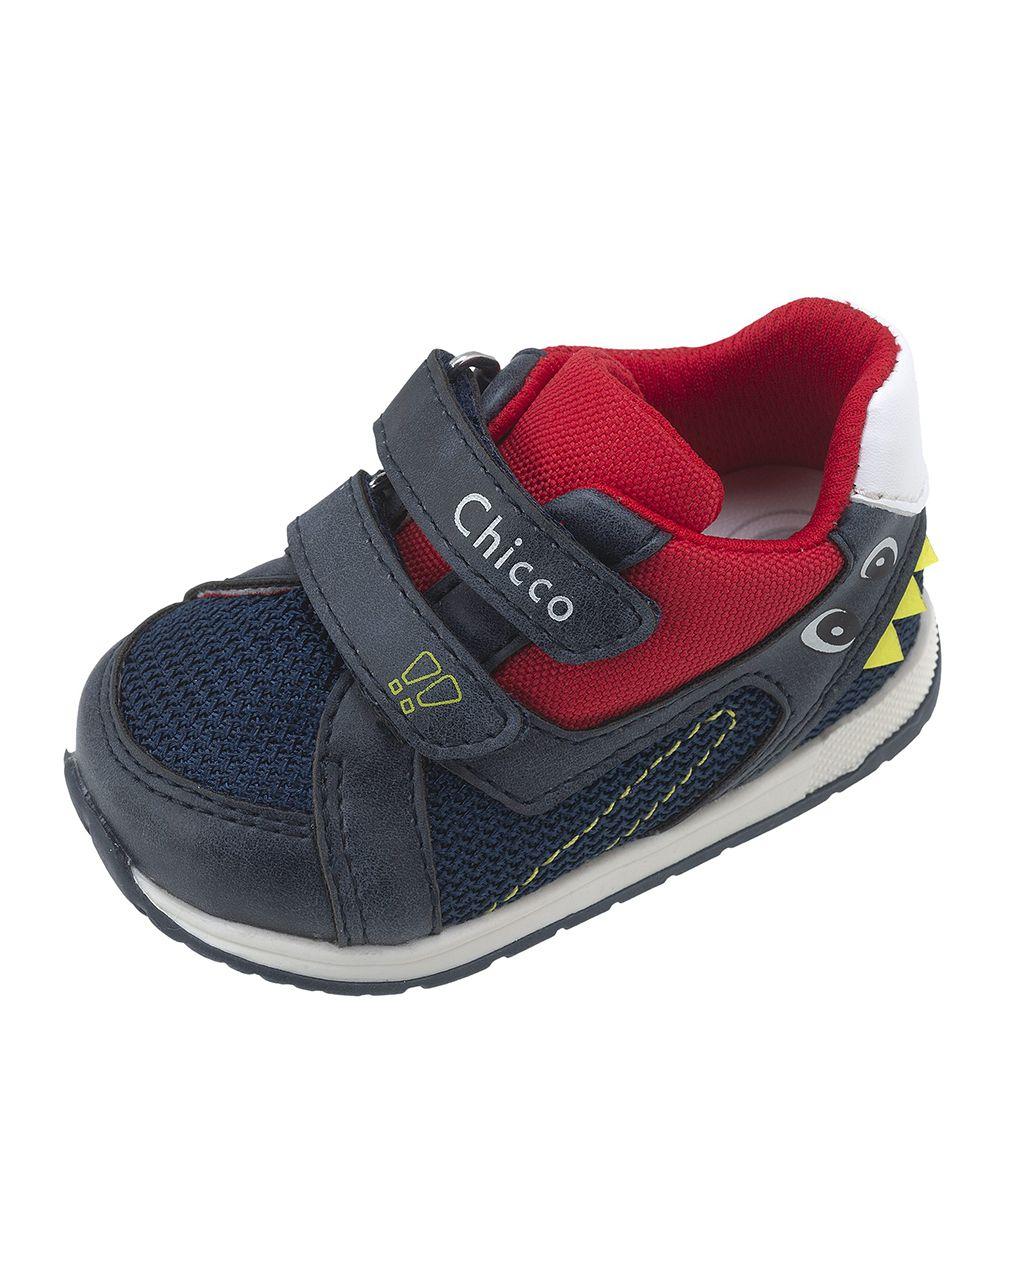 Sneakers maschio greco - Chicco